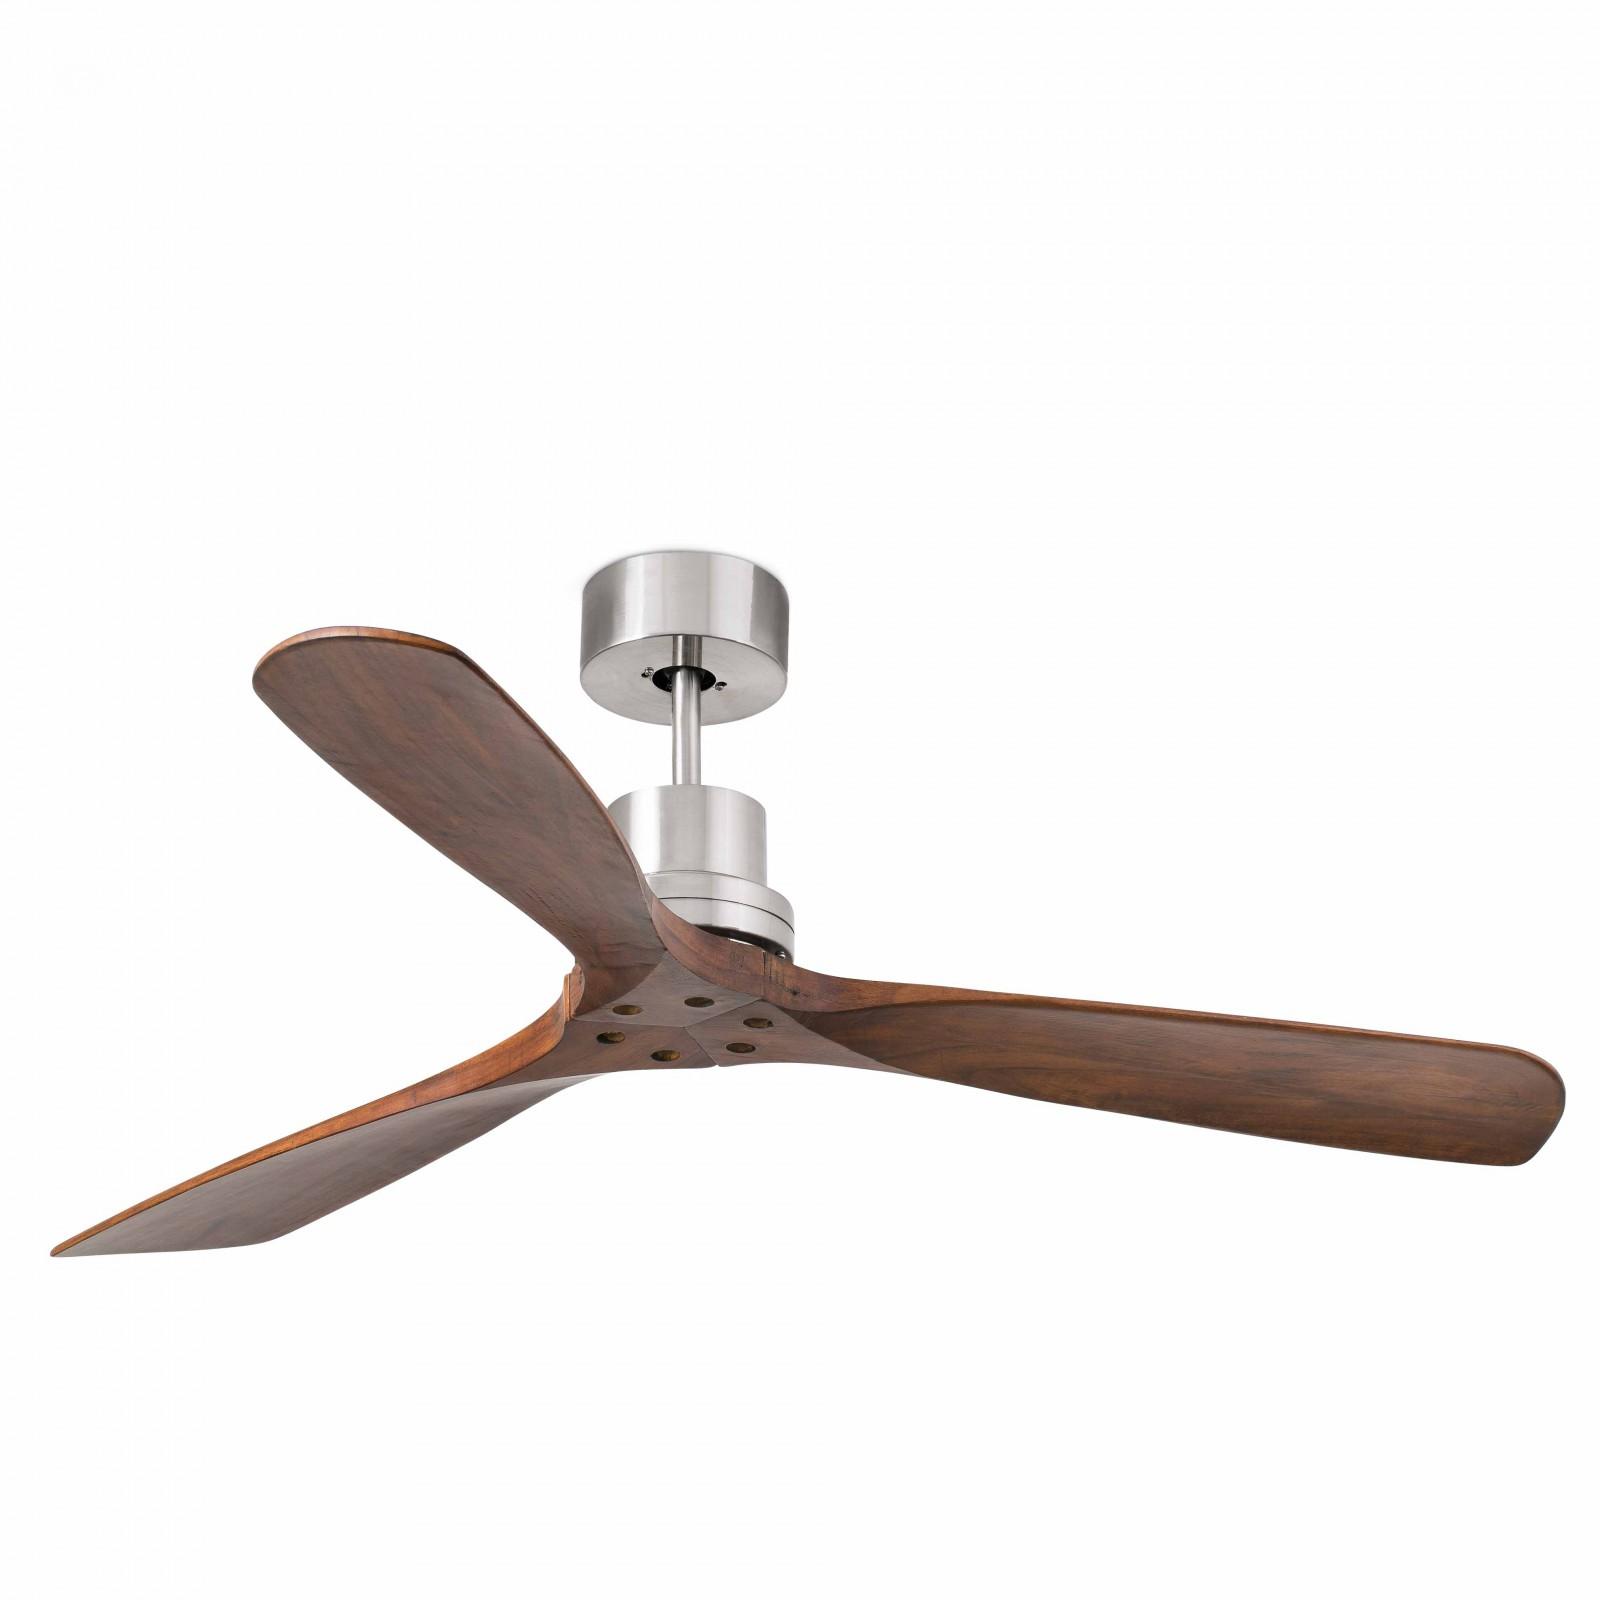 ceiling fans without lights remote control. Faro Ceiling Fan Lantau Nickel Matt Blades Walnut 132 Cm / 52\u0026quot; With Remote Control Fans Without Lights